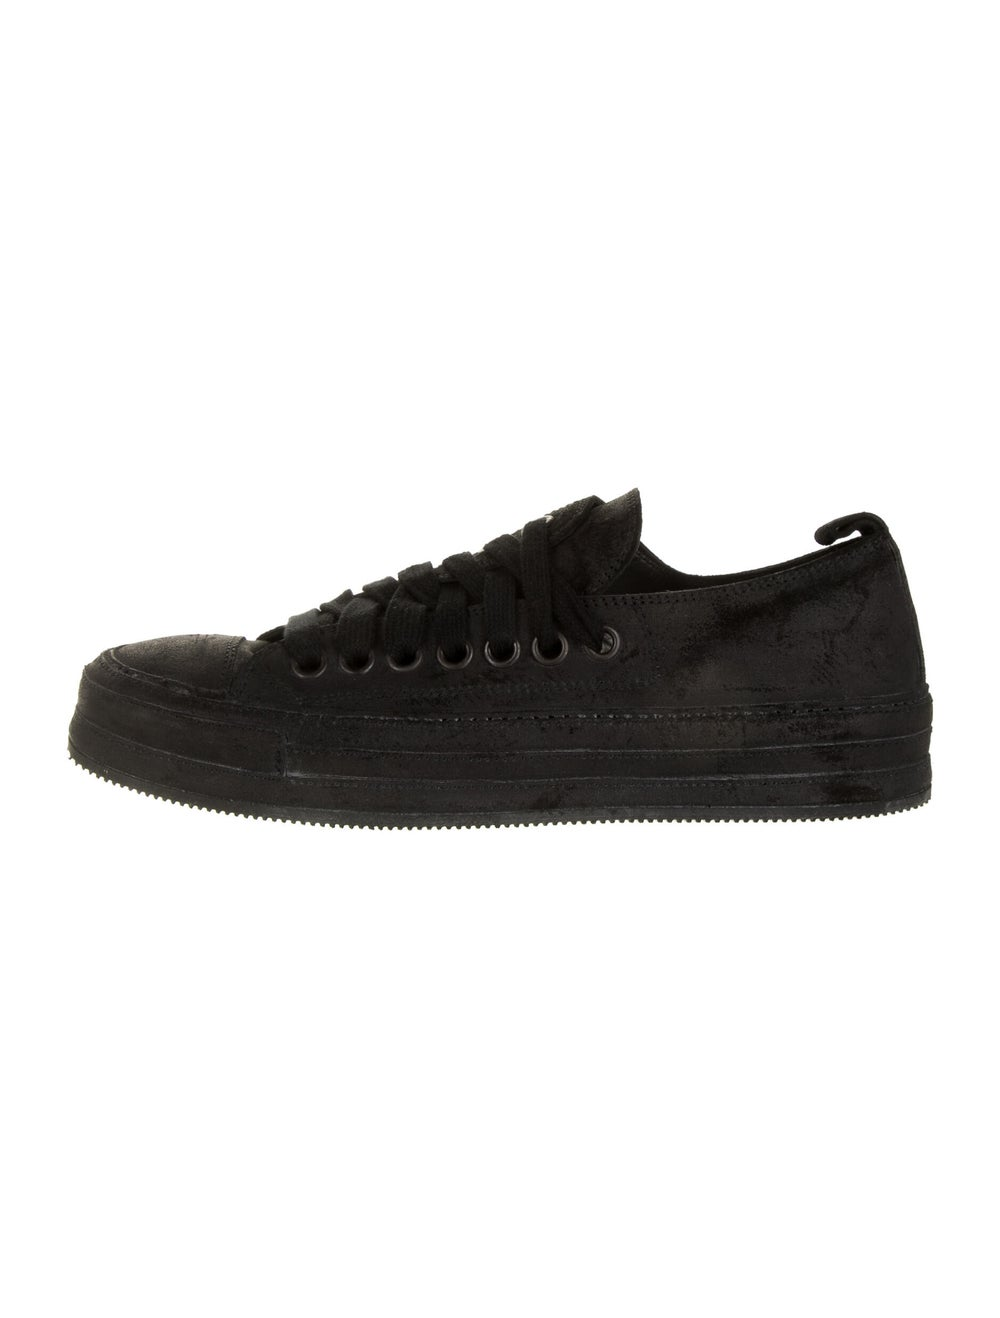 Ann Demeulemeester Suede Sneakers Black - image 1